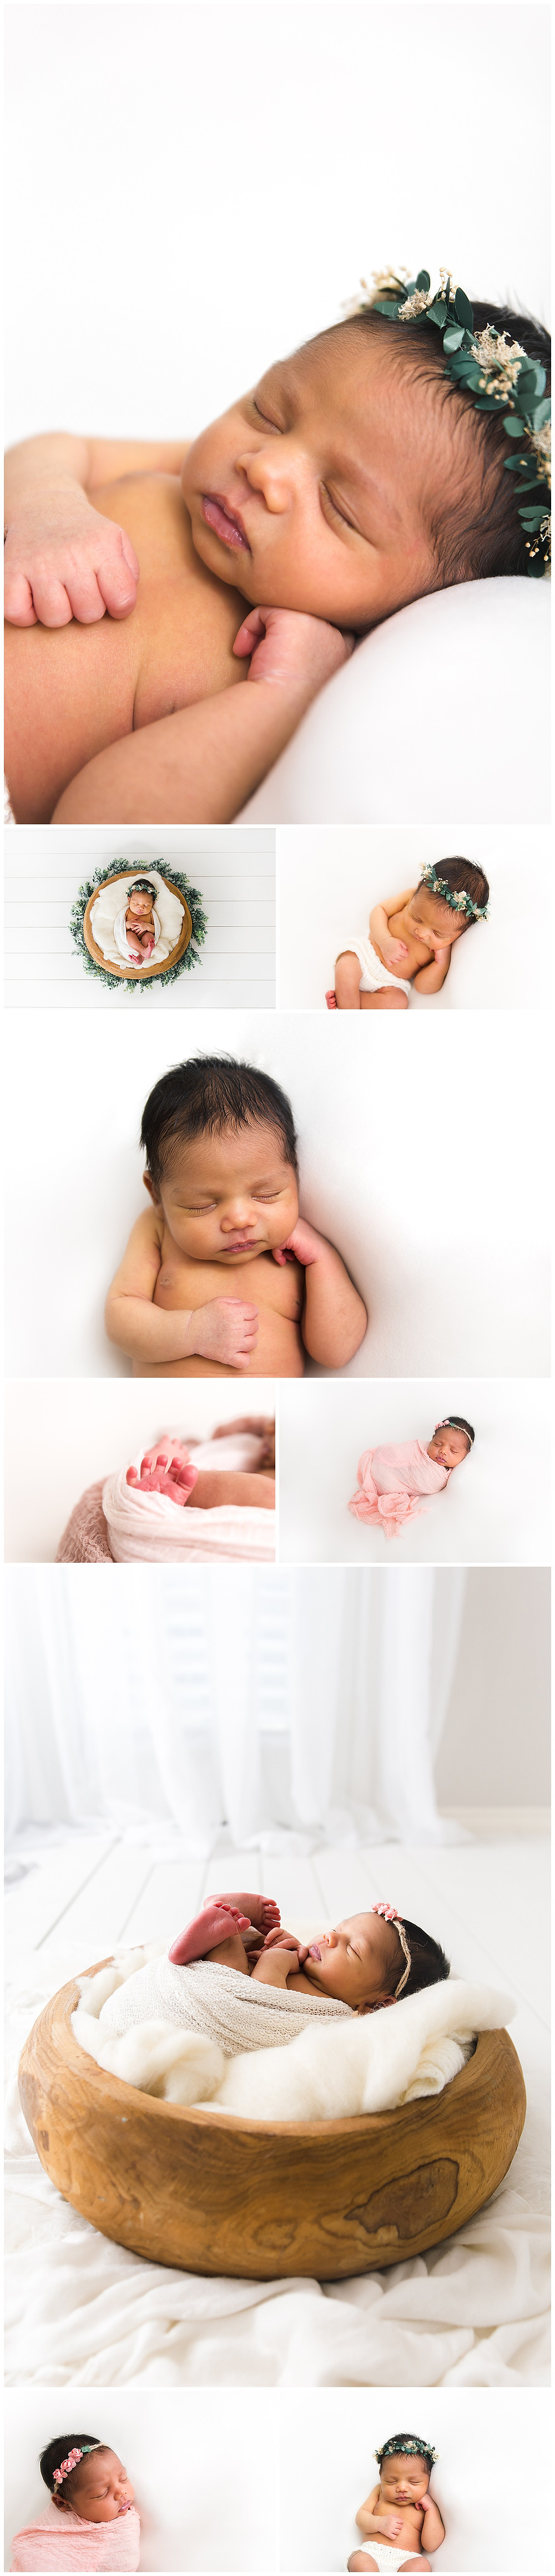 posing a newborn